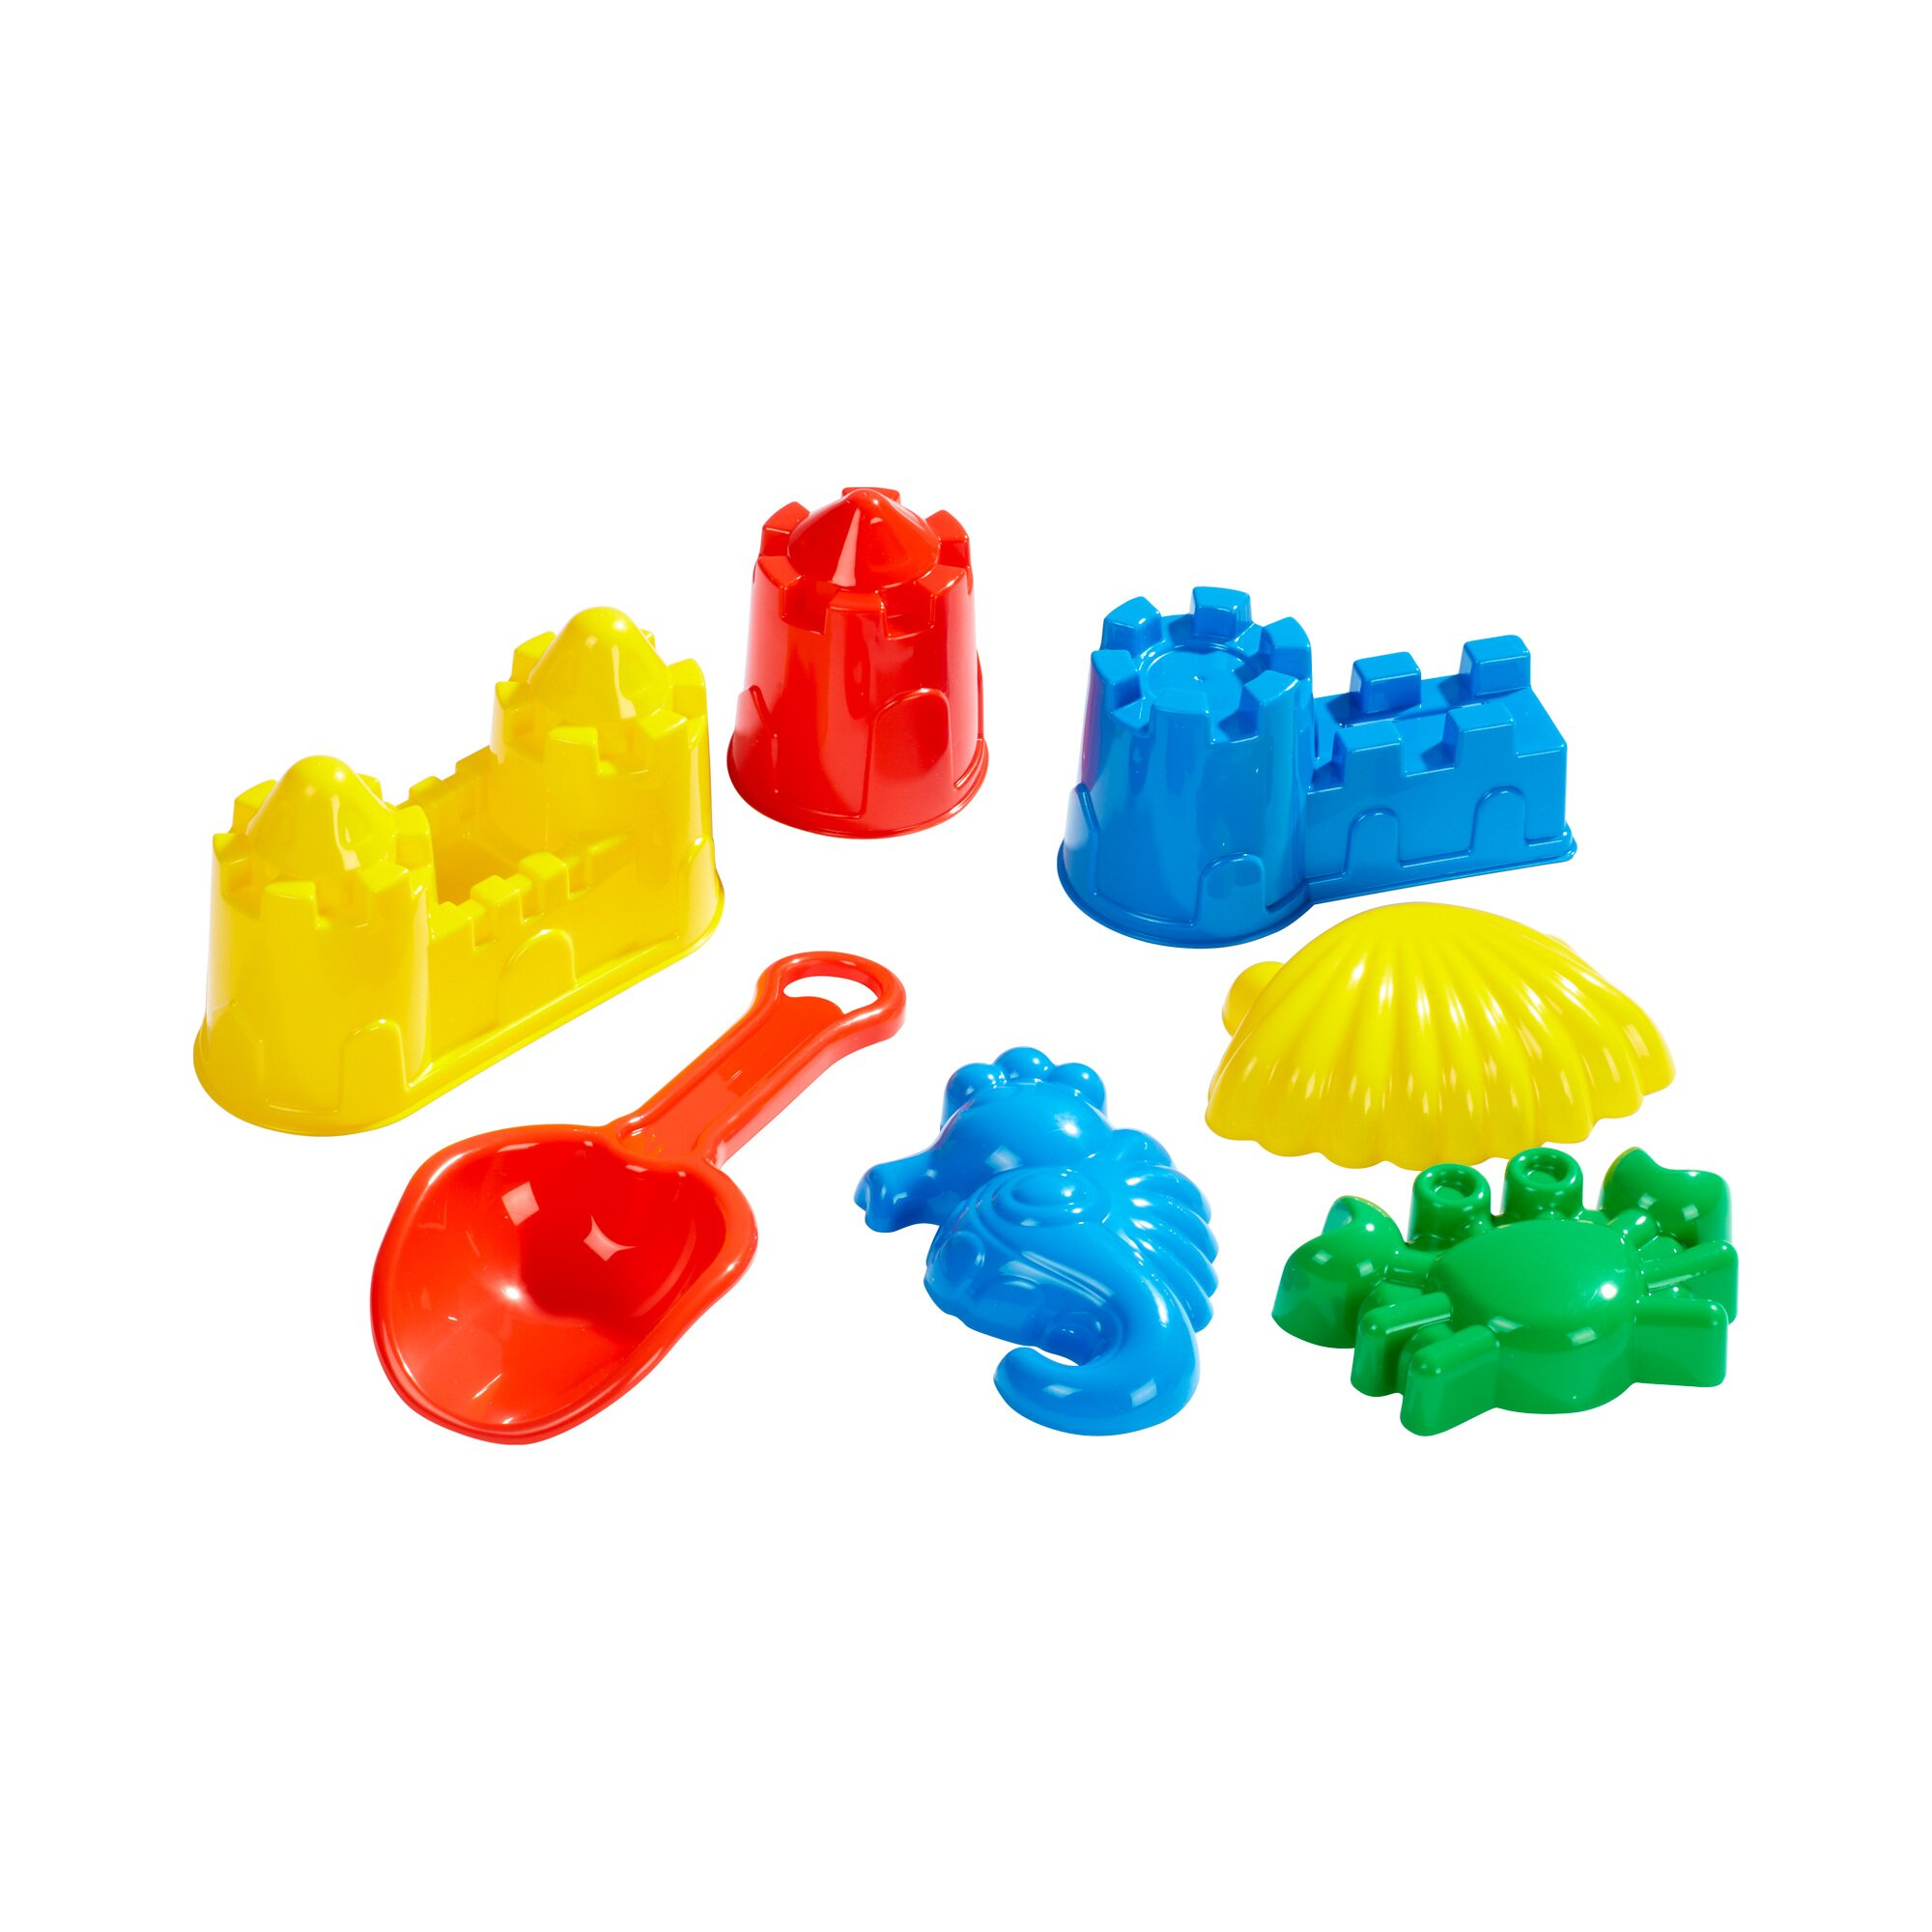 Solini 7-tlg. Sandspielzeug-Set Burgformen